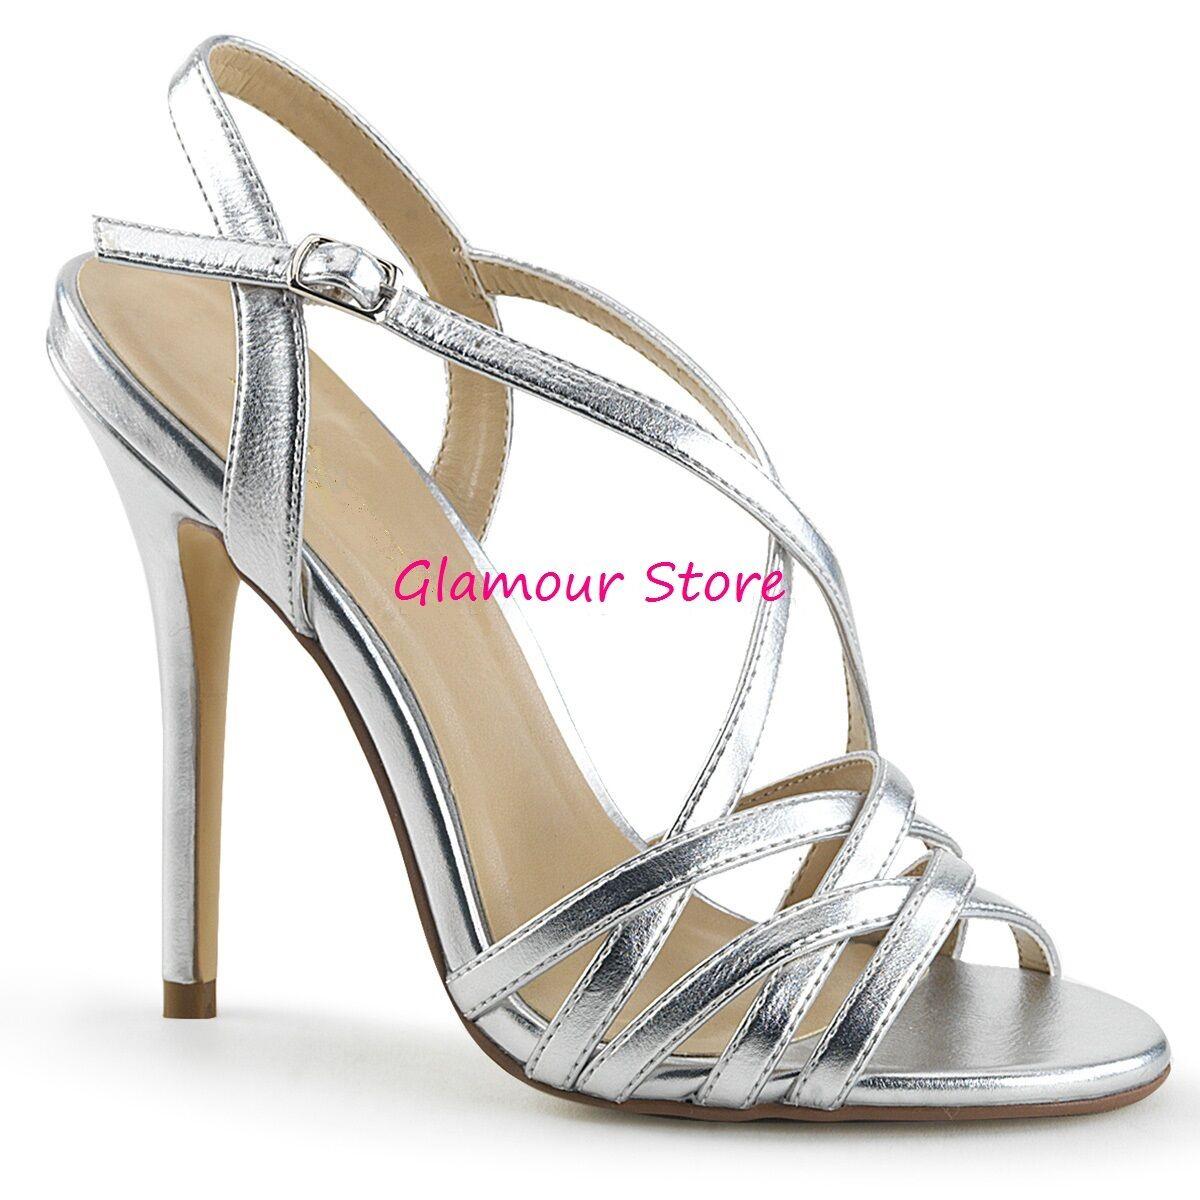 Sexy SANDALI argentooO tacco 13 dal 35 al 44 CRISS CROSS cinturino scarpe GLAMOUR